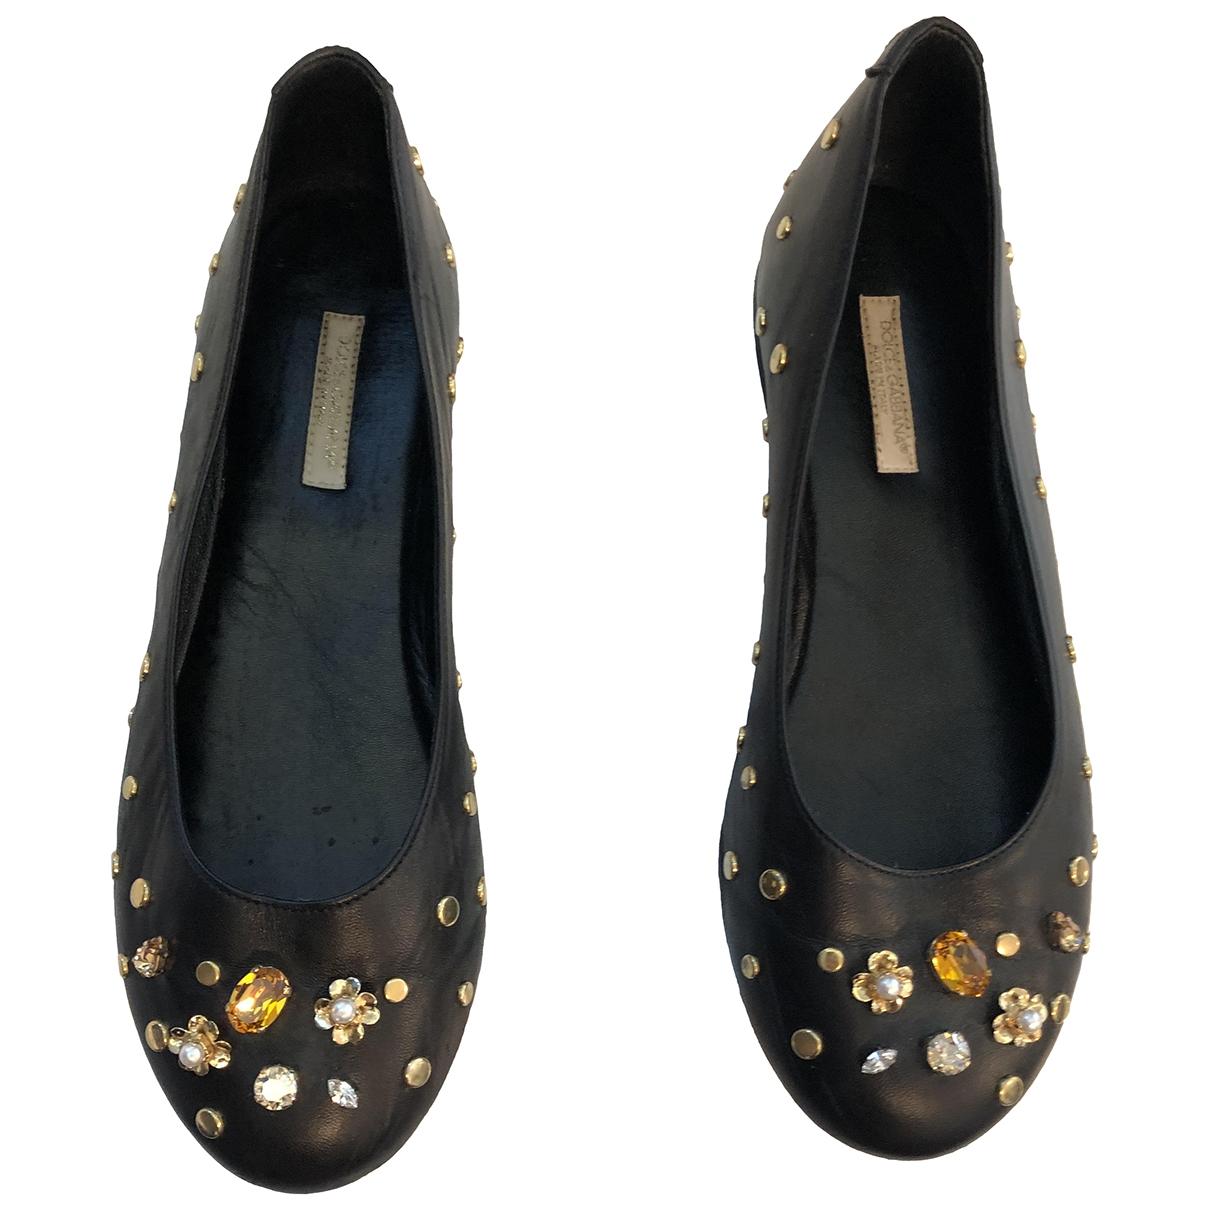 Bailarinas de Cuero Dolce & Gabbana